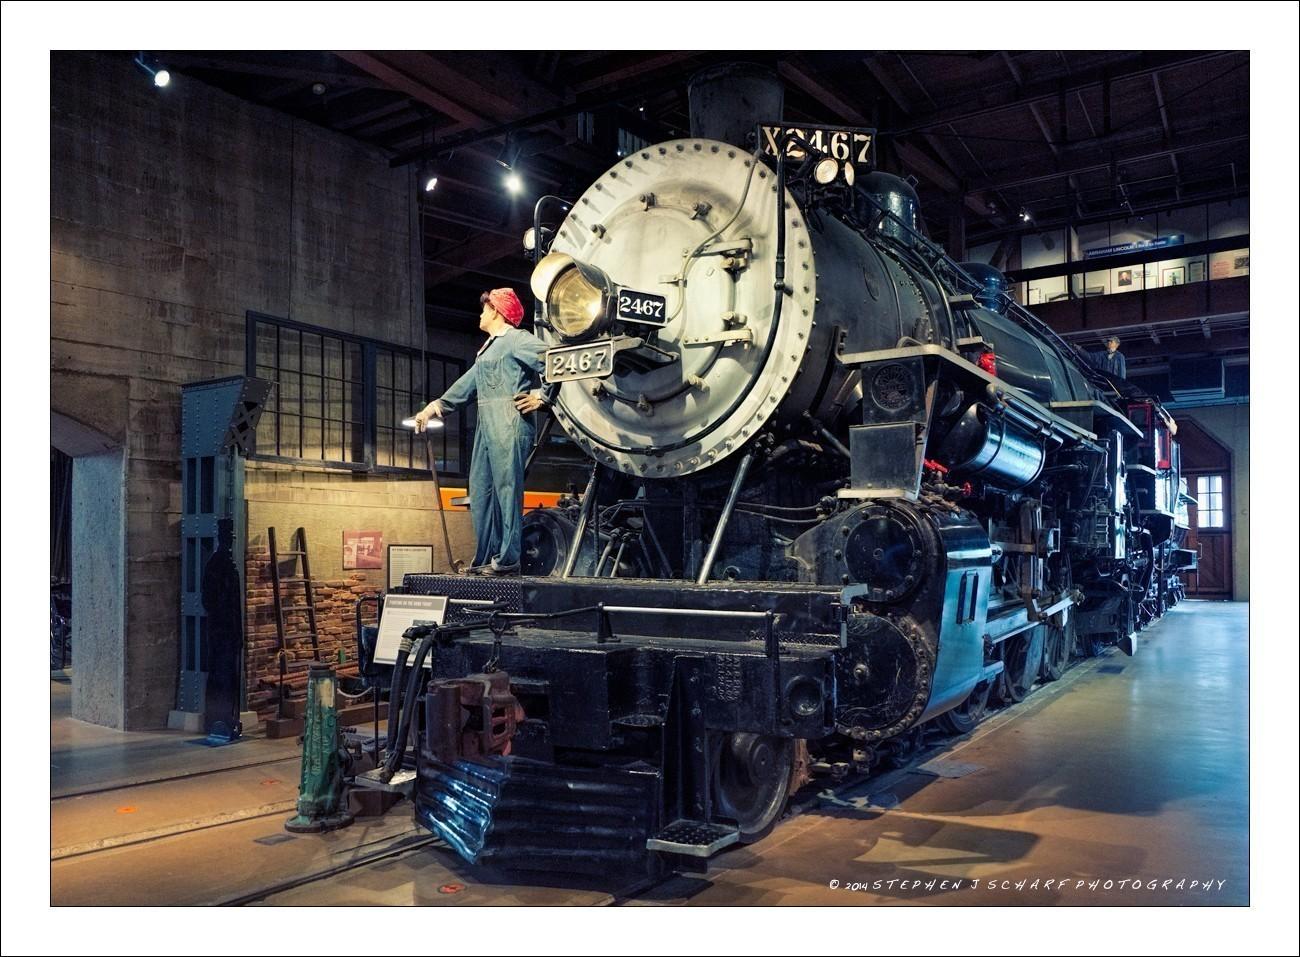 Engine-2467-Web.jpg